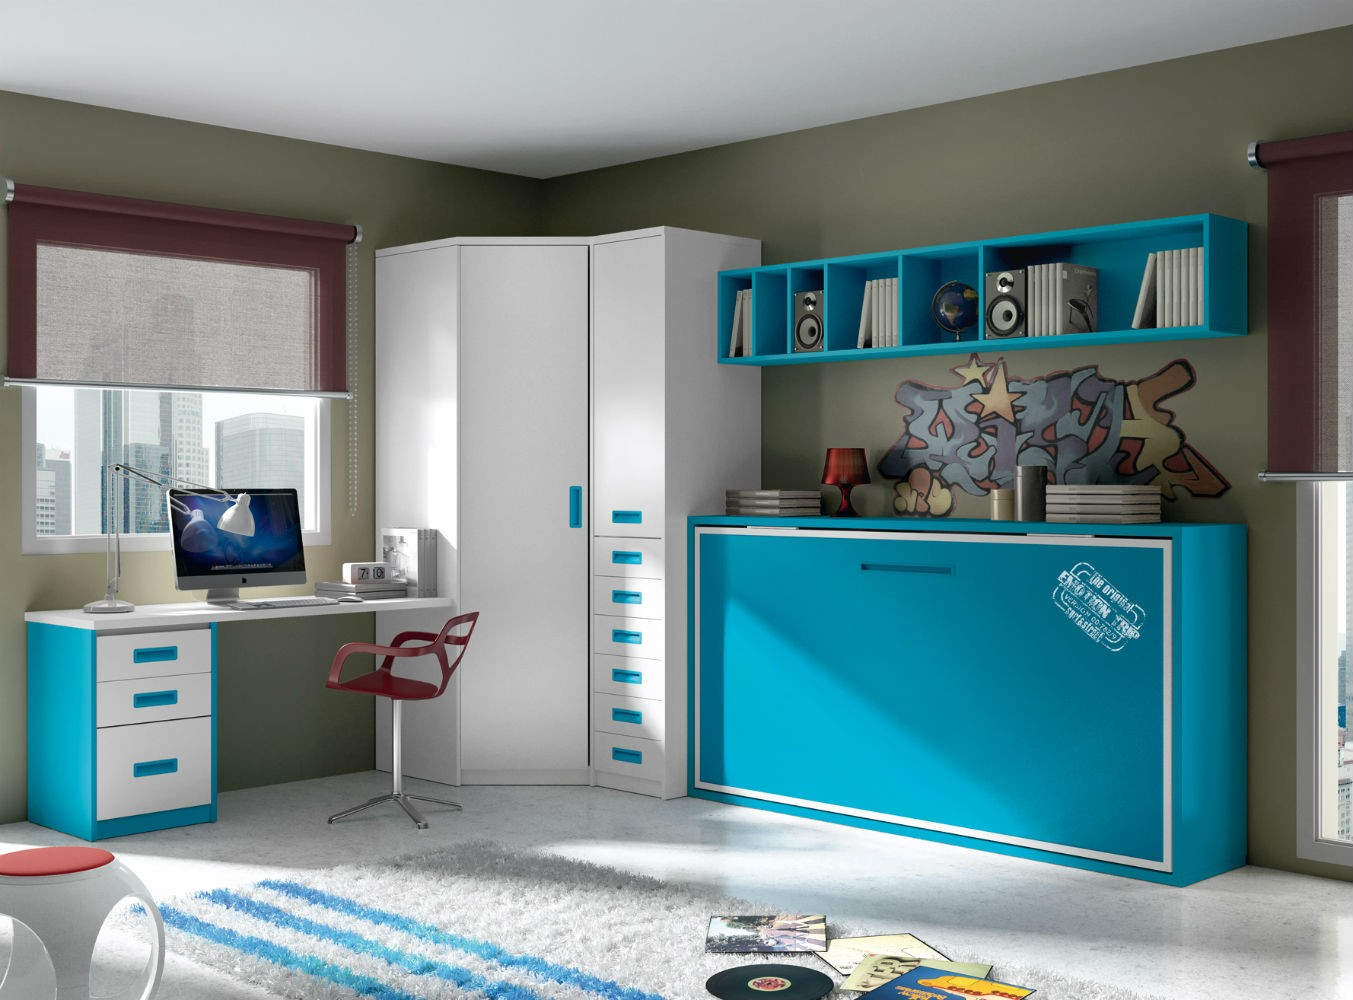 Dormitorio infantil juvenil moderno literas abatibles 69 f216 for Dormitorio juvenil cama alta